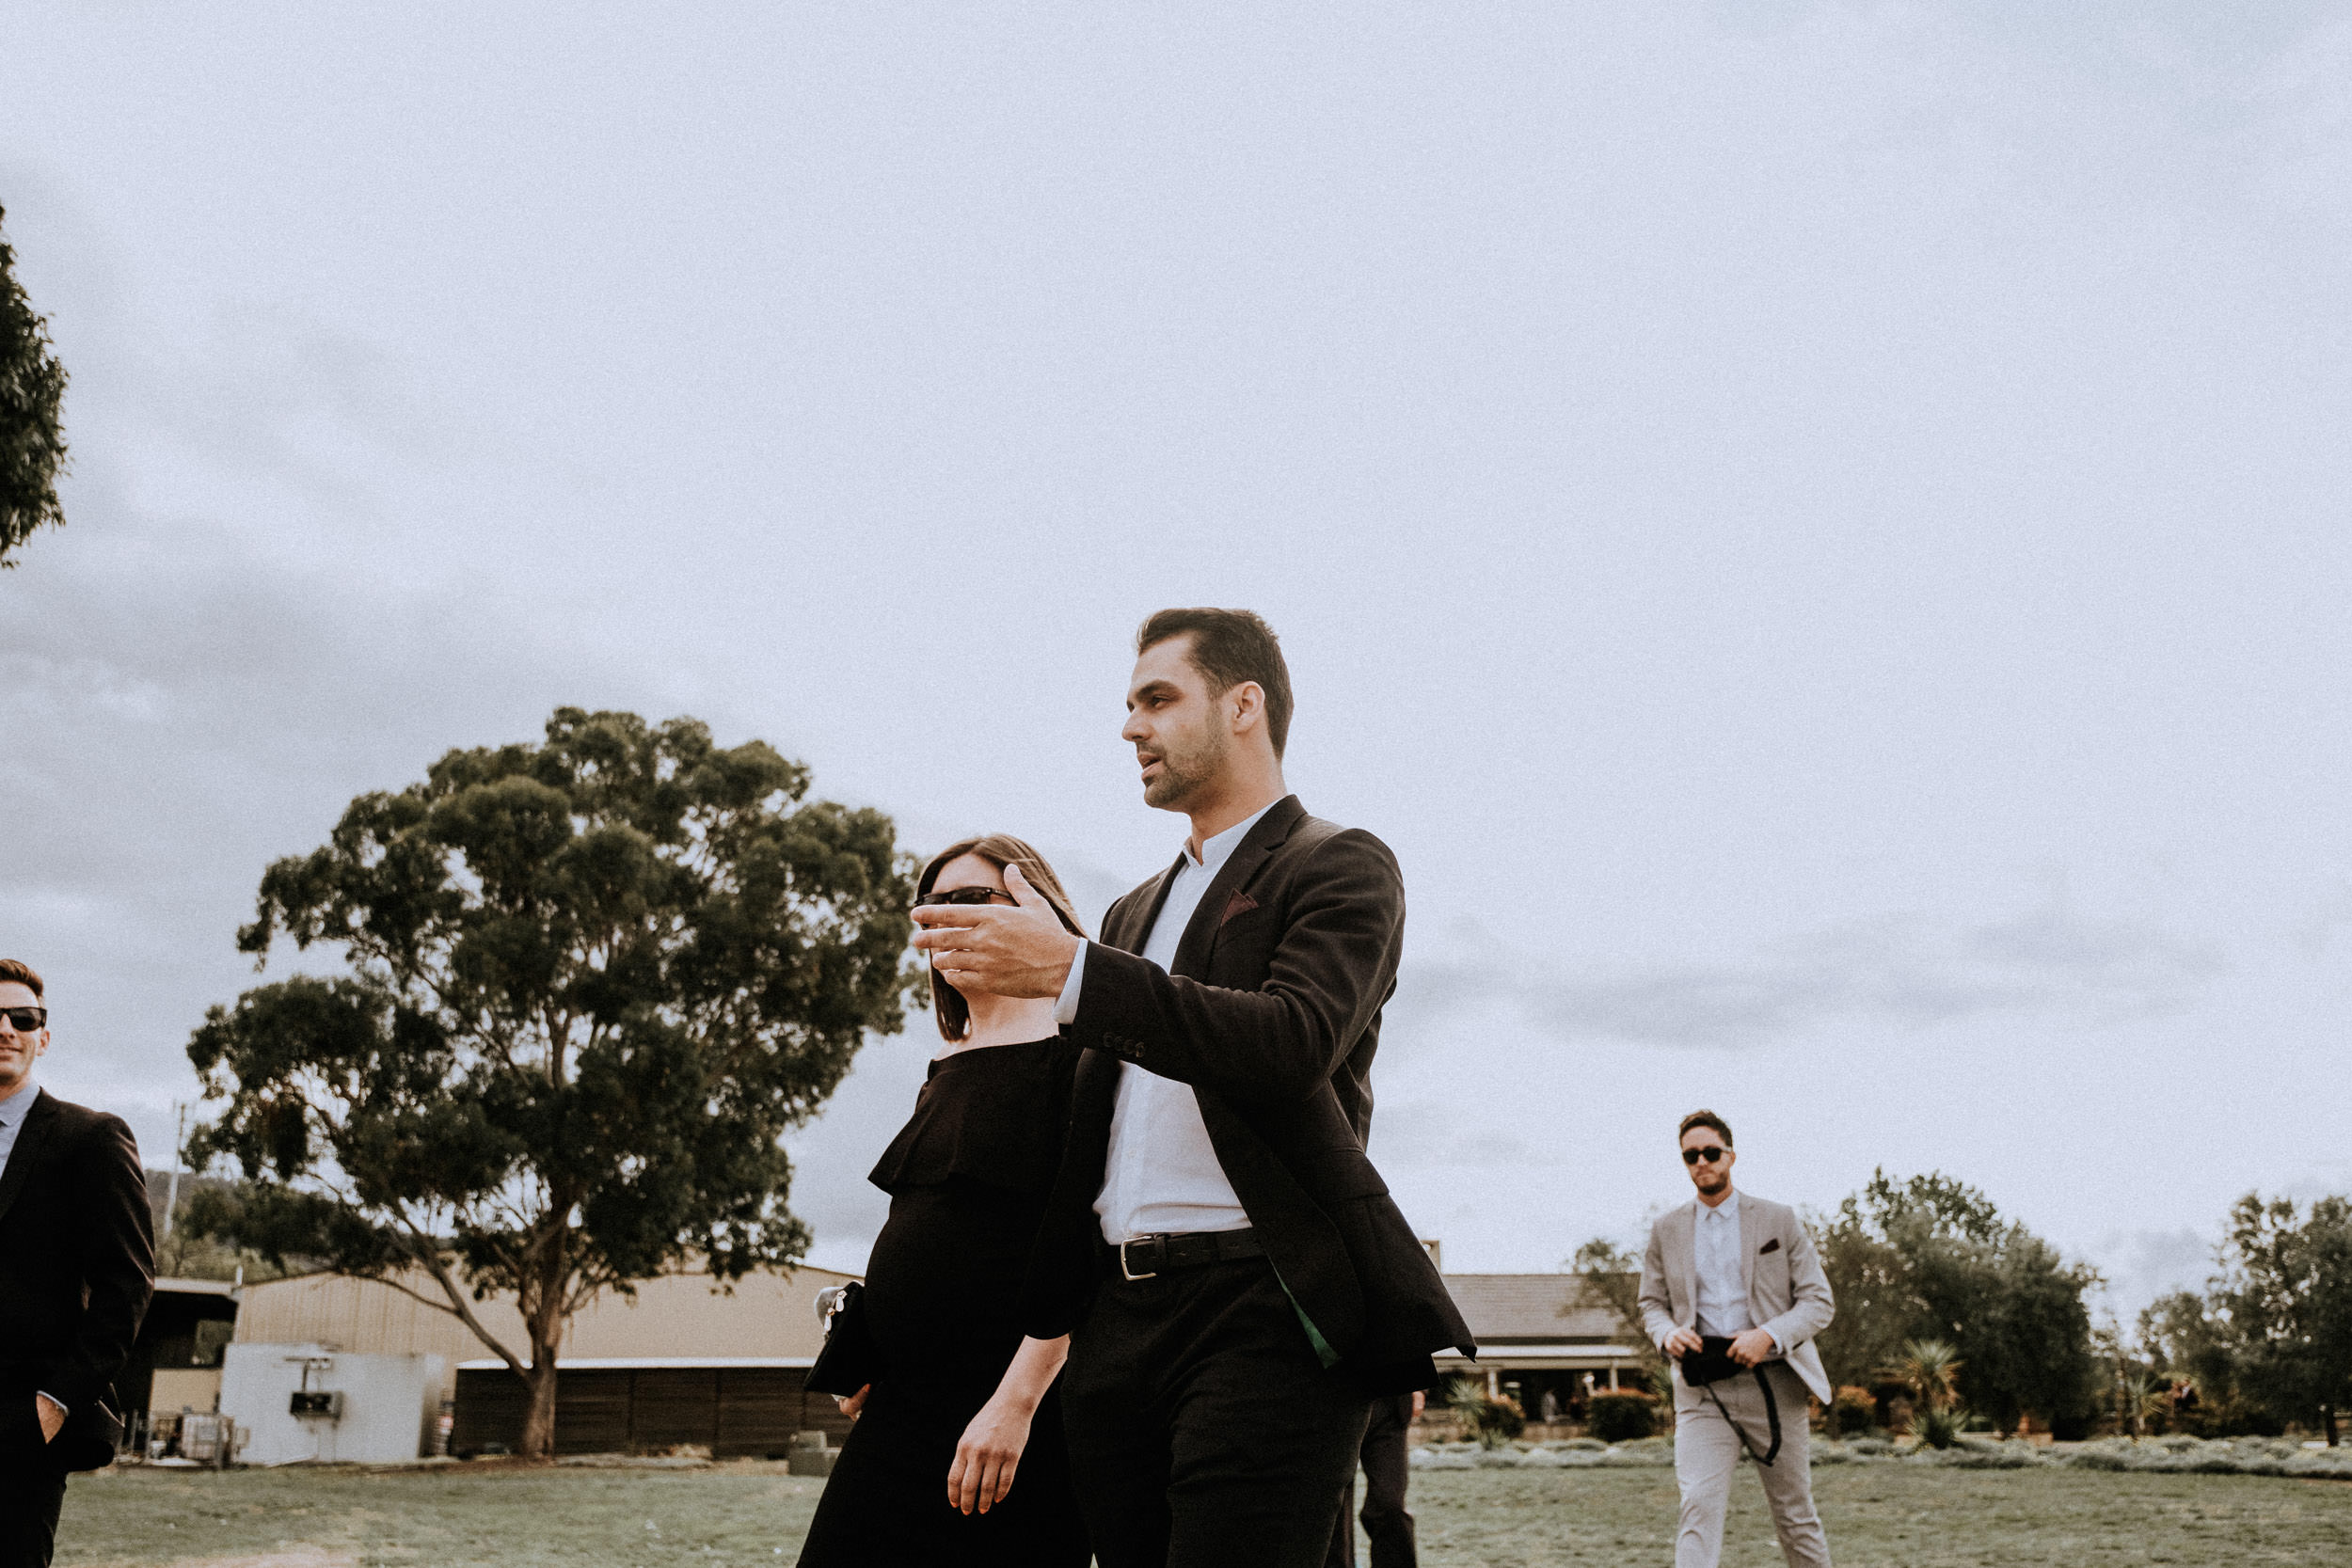 s+j_top_elopement wedding photography_kings & thieves_blog - 159.jpg